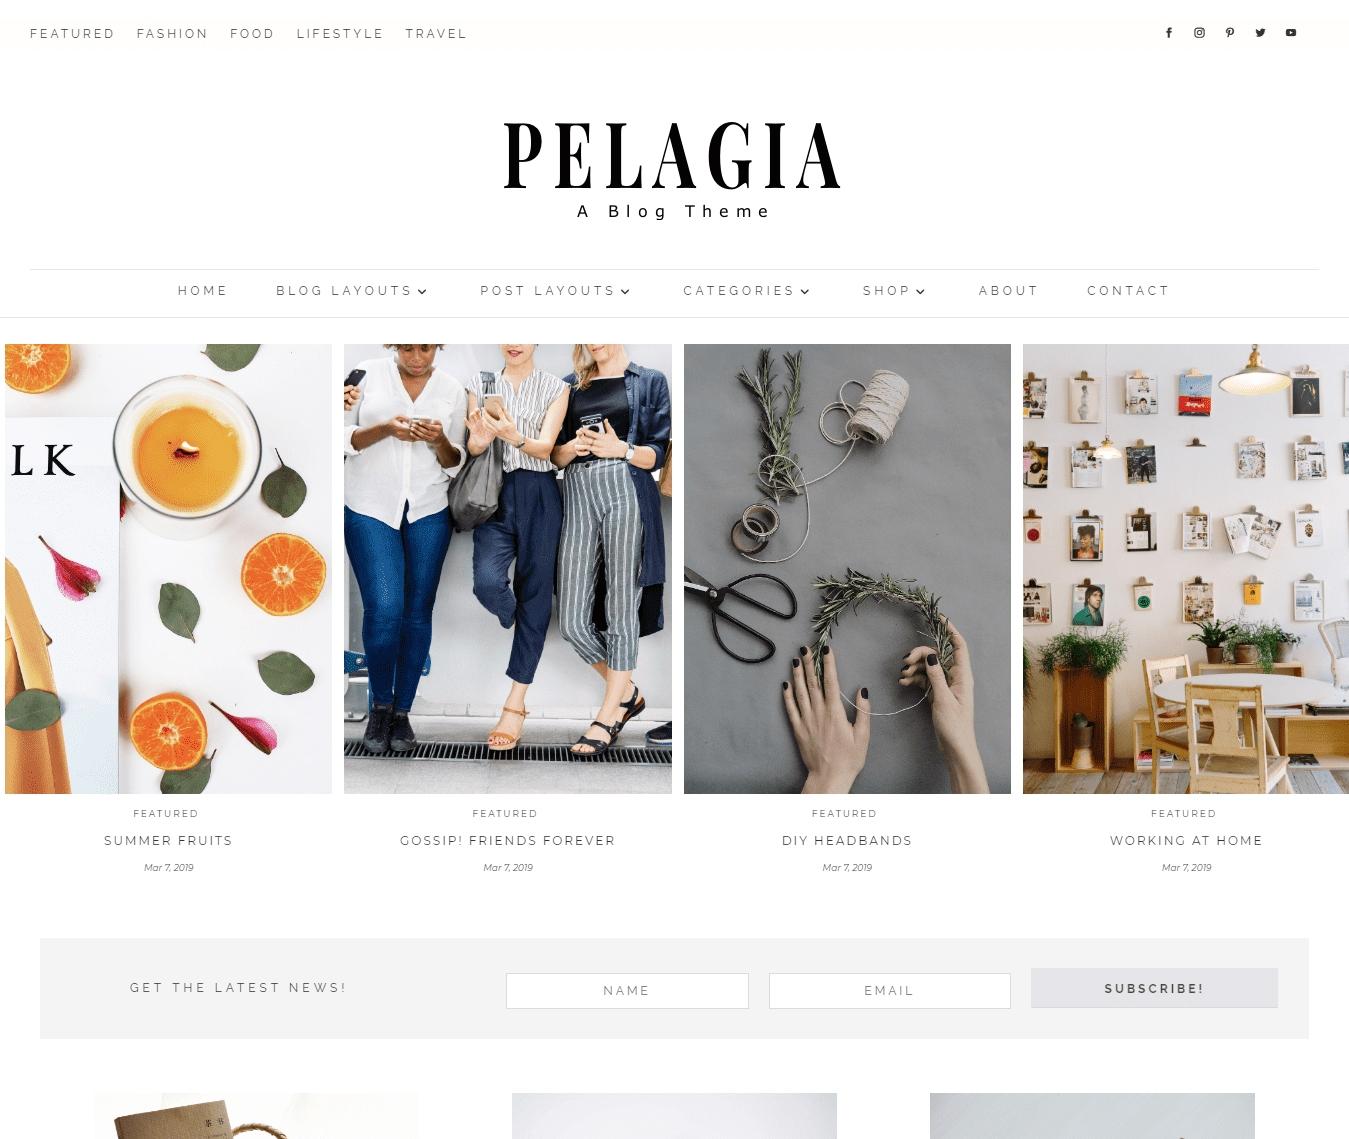 Pelagia, a minimalist, feminine masonry blog theme for Divi.